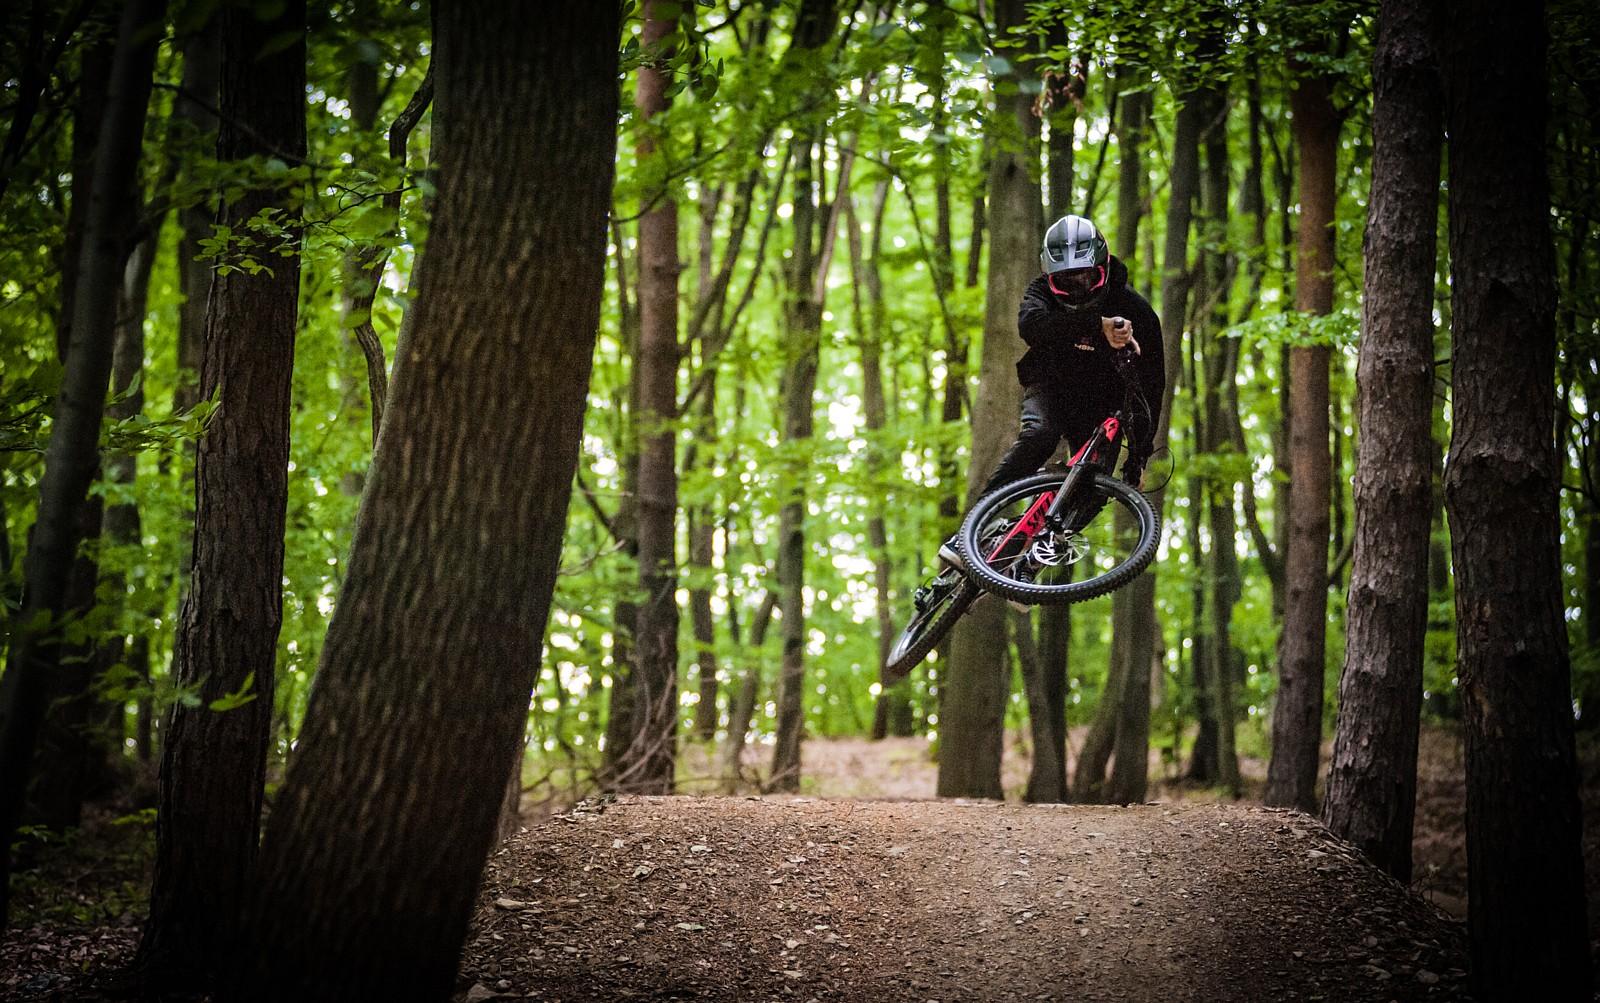 hriesny (1 of 107) - purehell - Mountain Biking Pictures - Vital MTB